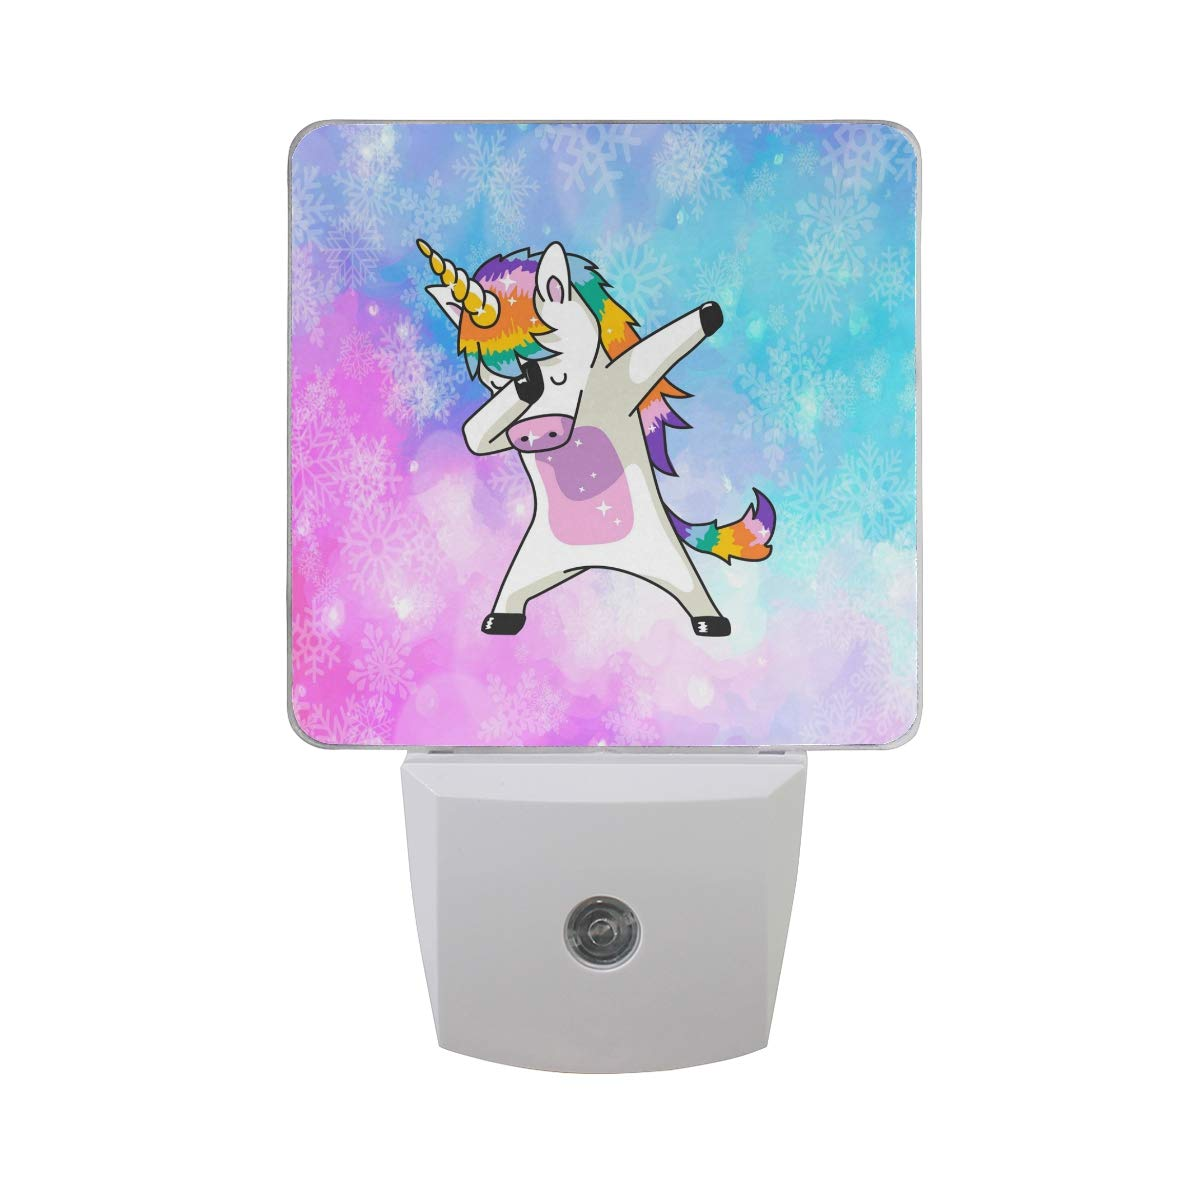 WXLIFE Galaxy Space Snowflake Unicorn Led Night Light 2 Pack, Auto Sensor Dusk to Dawn Night Light for Kids Boys Girls Toddler Bathroom Bedroom Hallway Decor